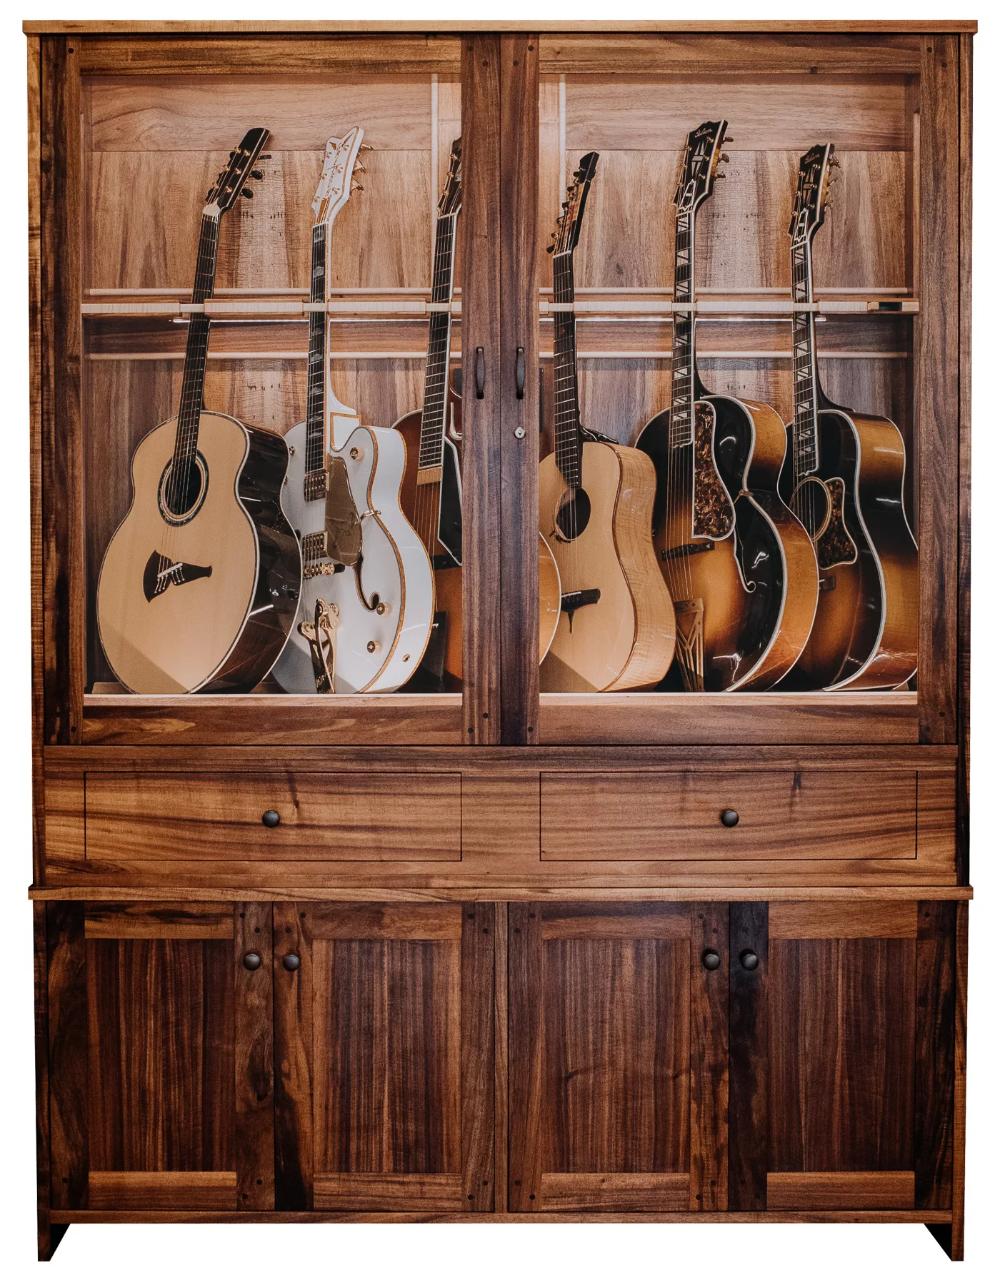 Guitar Estate Guitar Humidifier Cabinets American Music Furniture Guitar Display Case Guitar Storage Cabinet Guitar Display